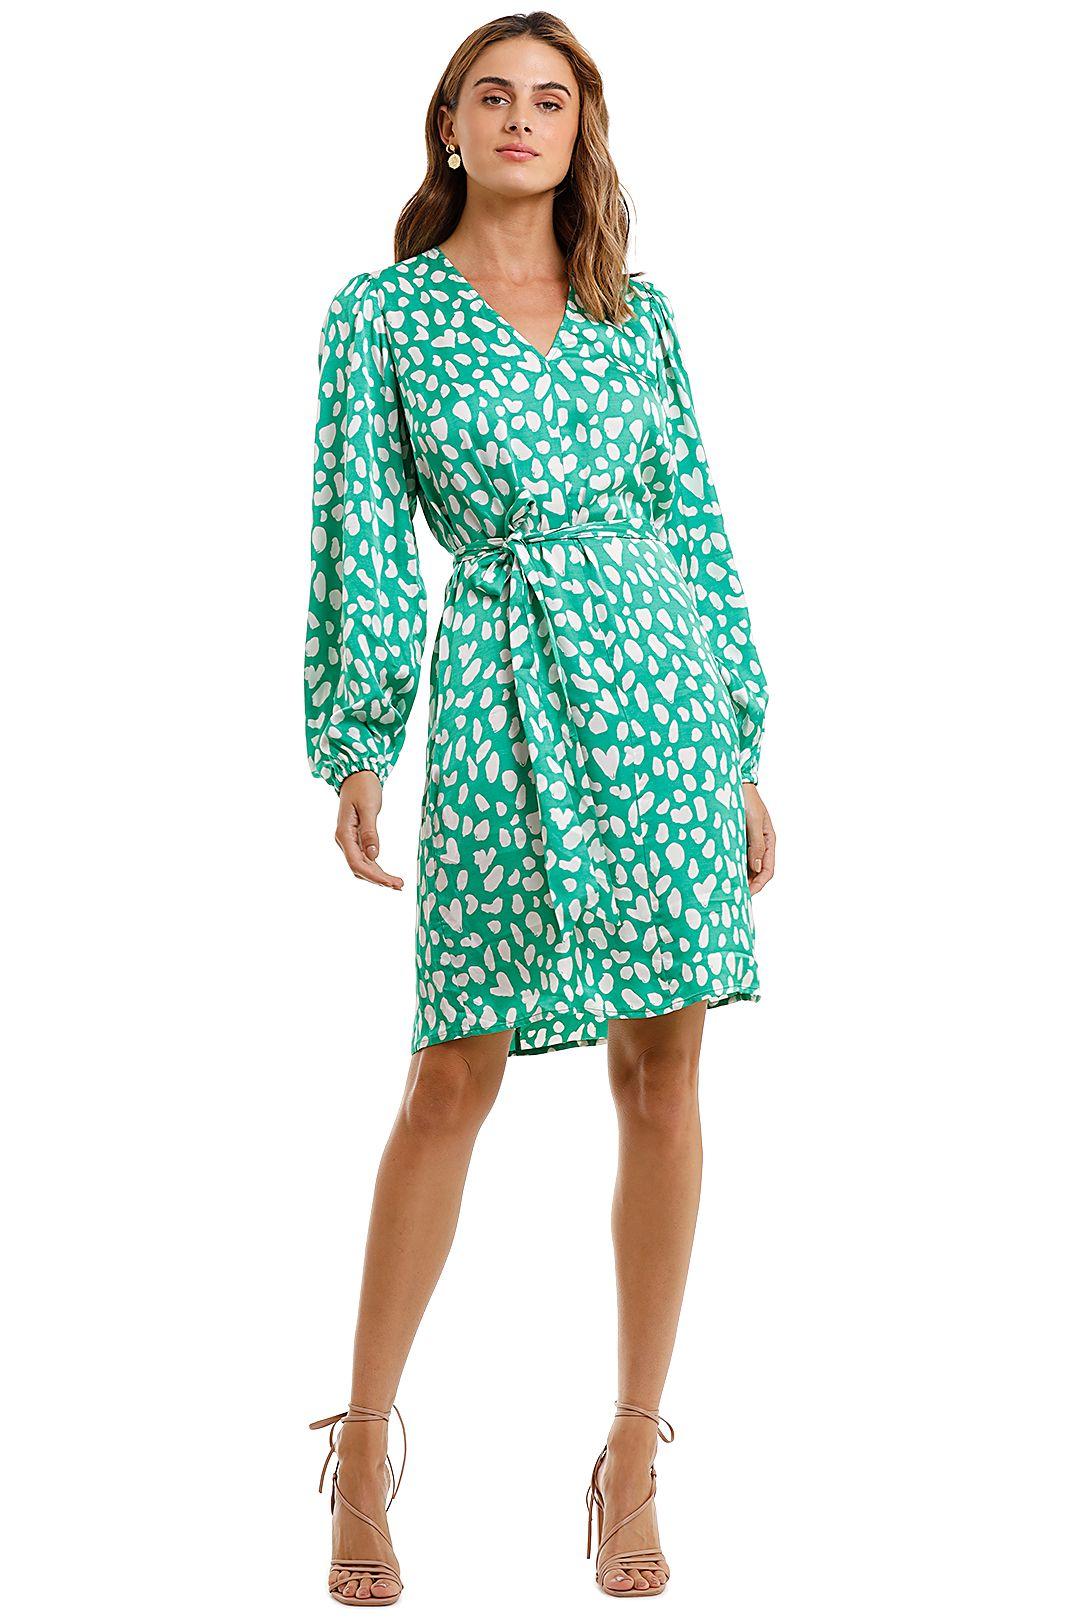 KITRI Kate Long Sleeve Dress Green